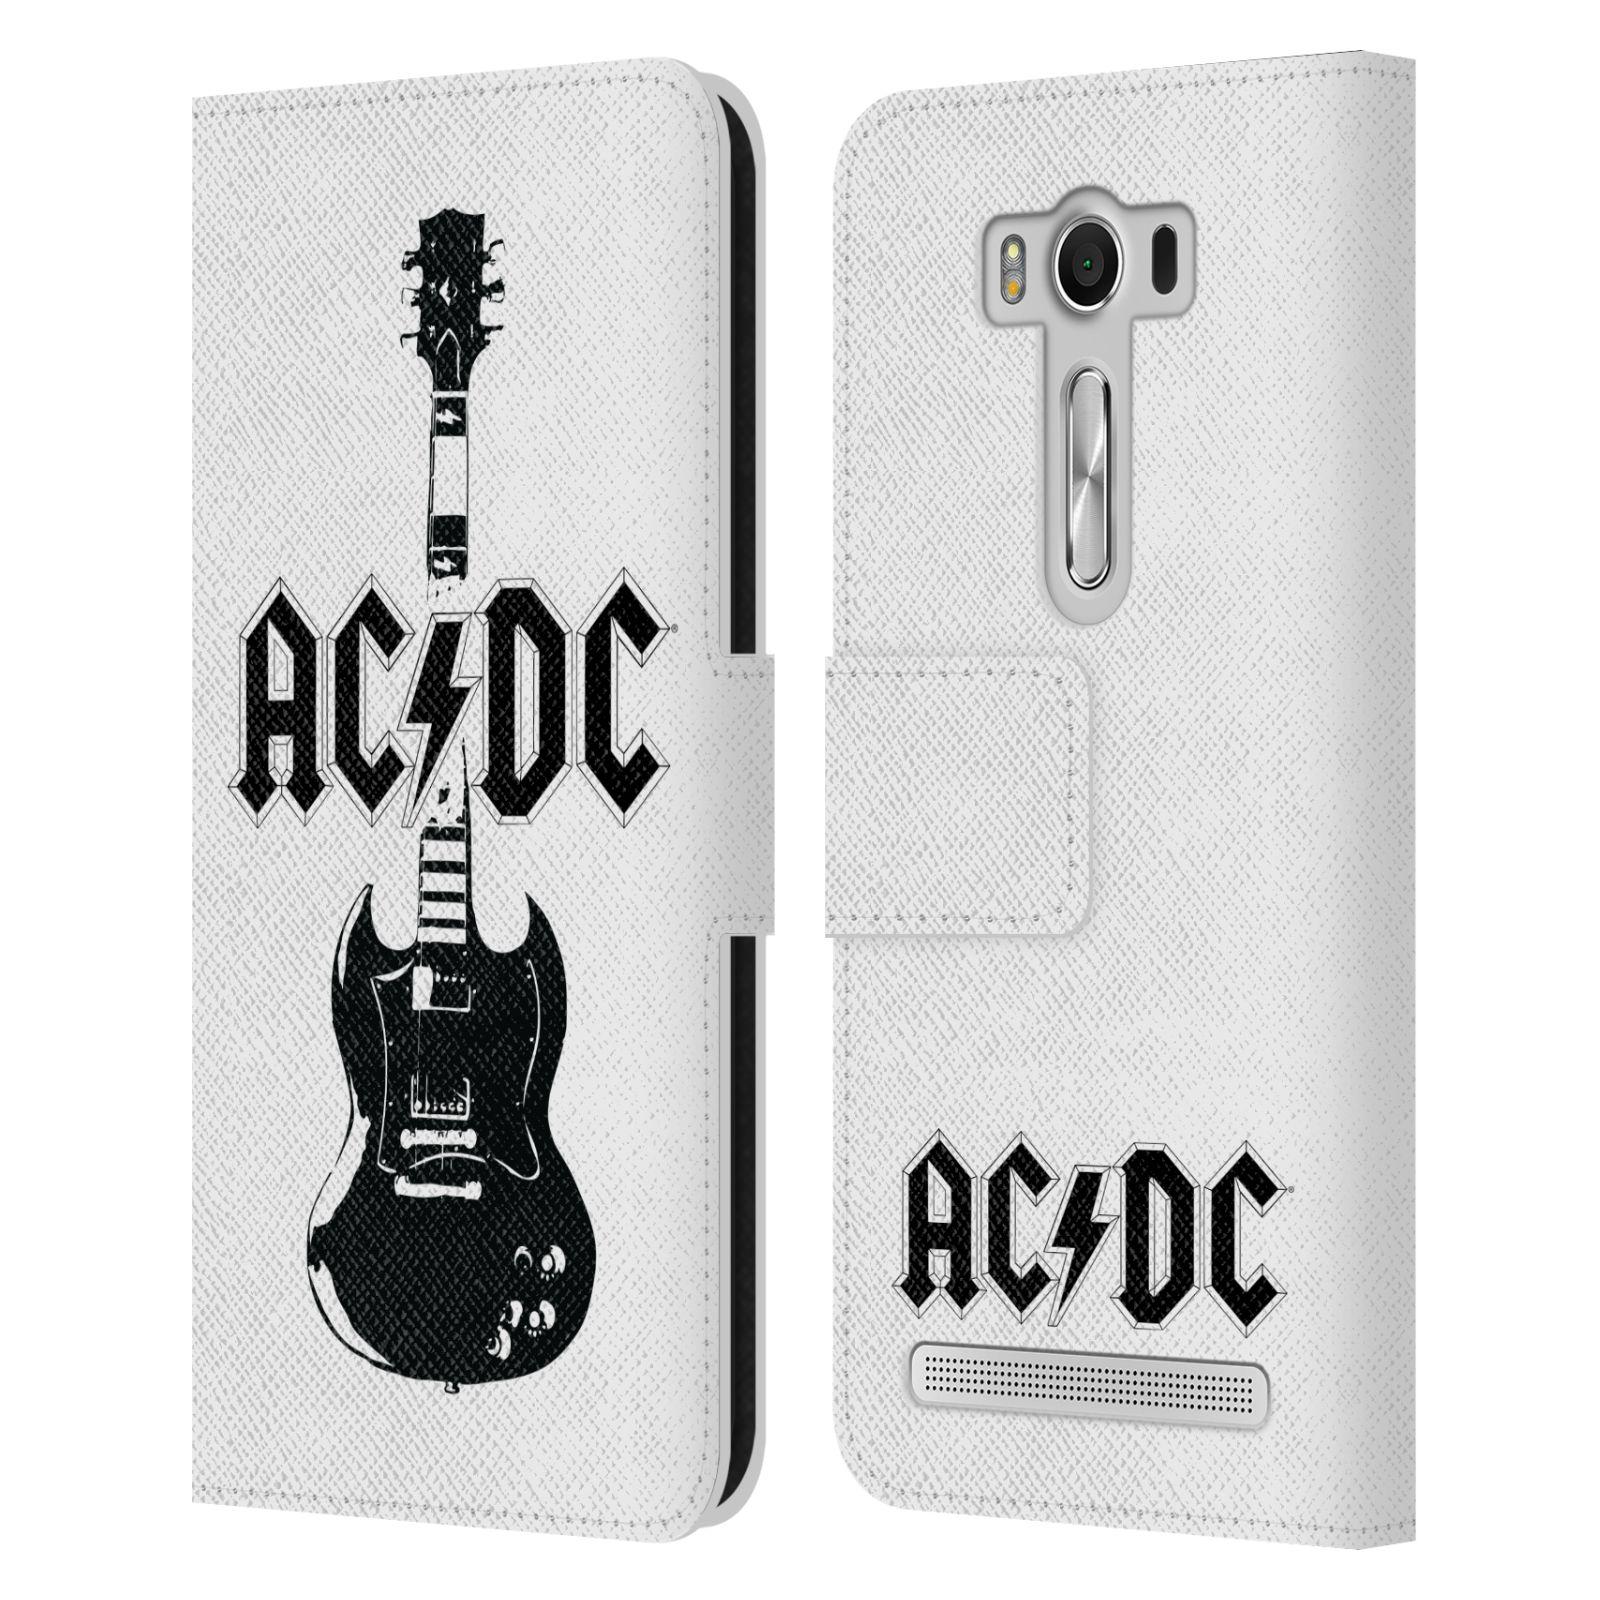 Pouzdro na mobil Asus Zenfone 2 Laser ZE500KL - Head Case - Rockova skupina ACDC kytara